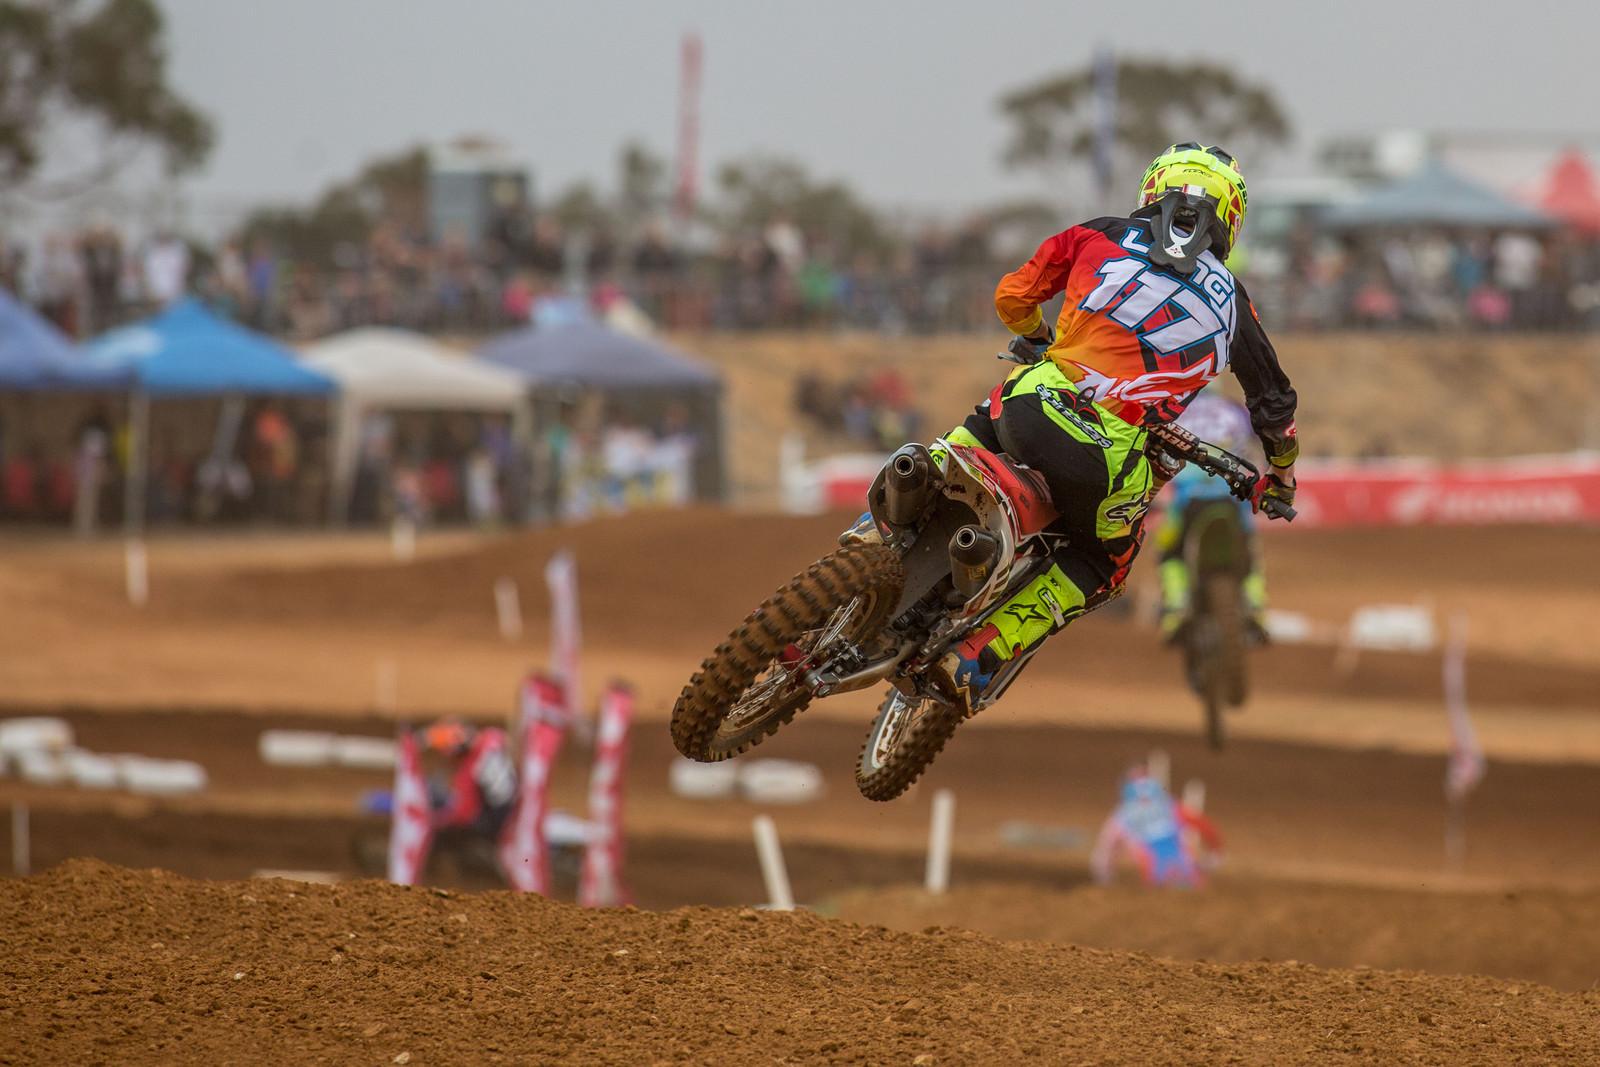 Dylan Long - Australian Motul Mx Championships: Round 4, Murray Bridge - Motocross Pictures - Vital MX